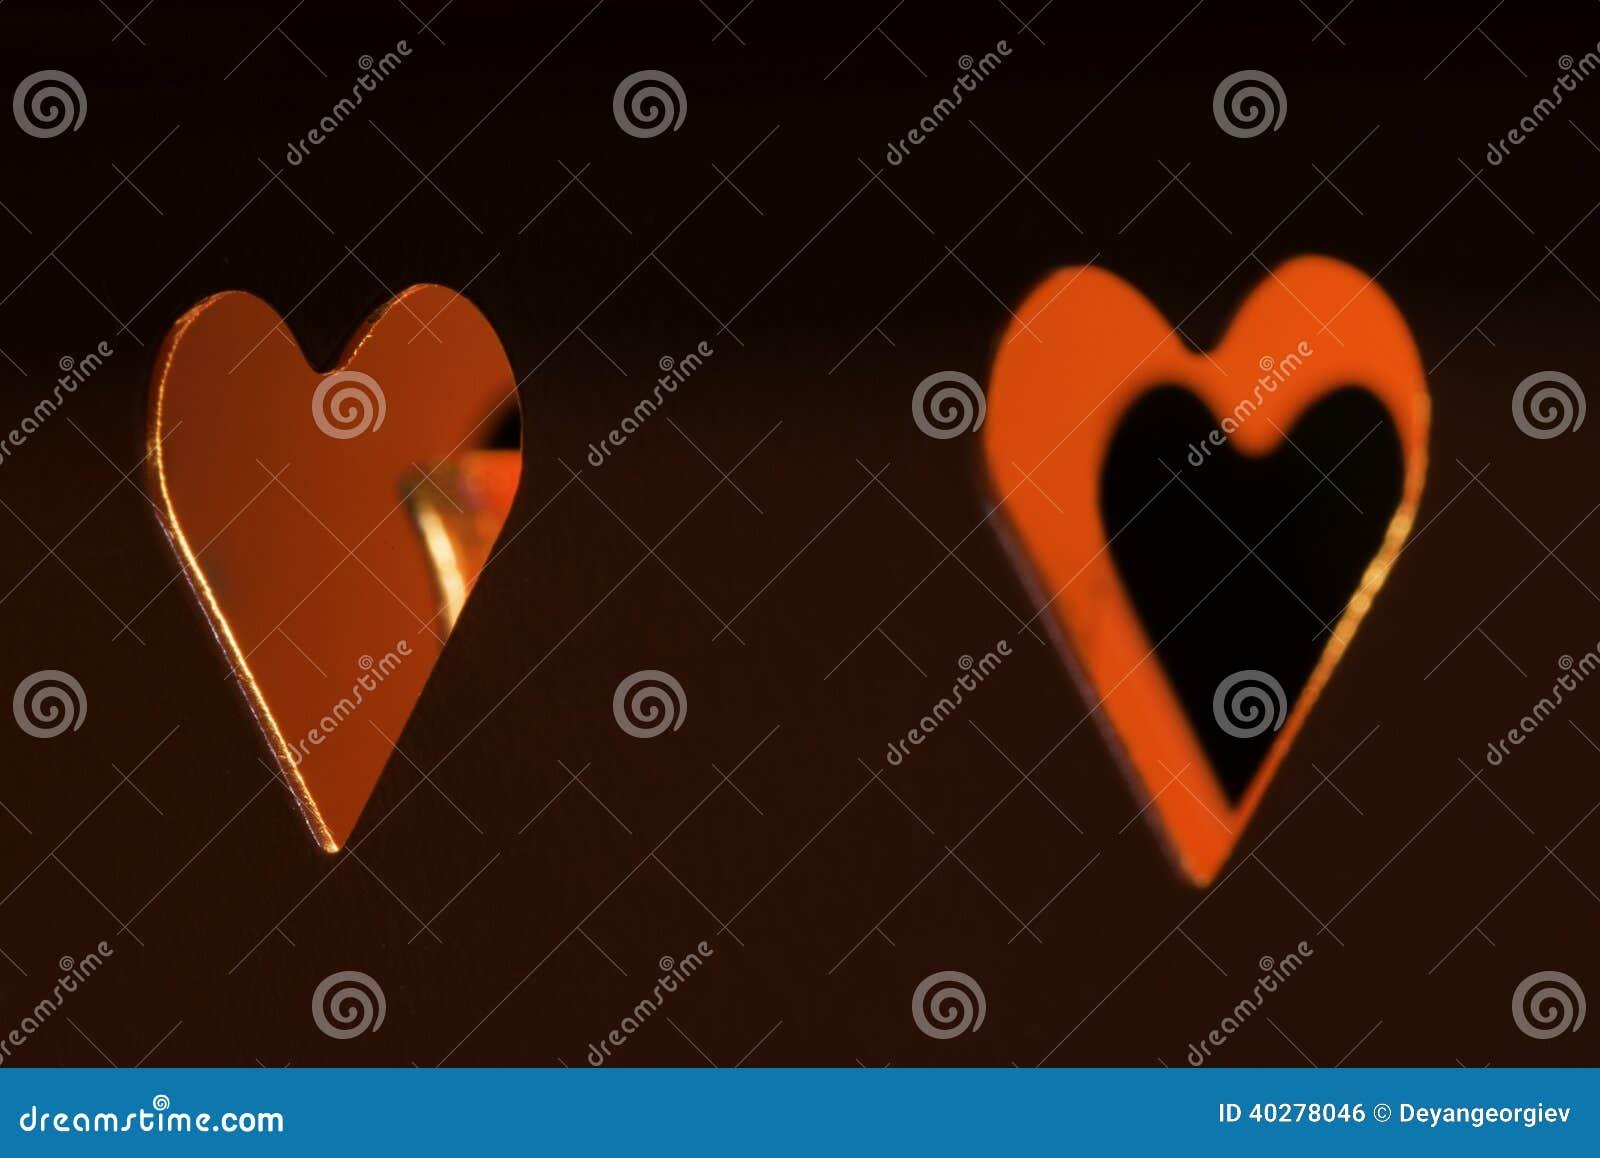 Свечи и формы сердца